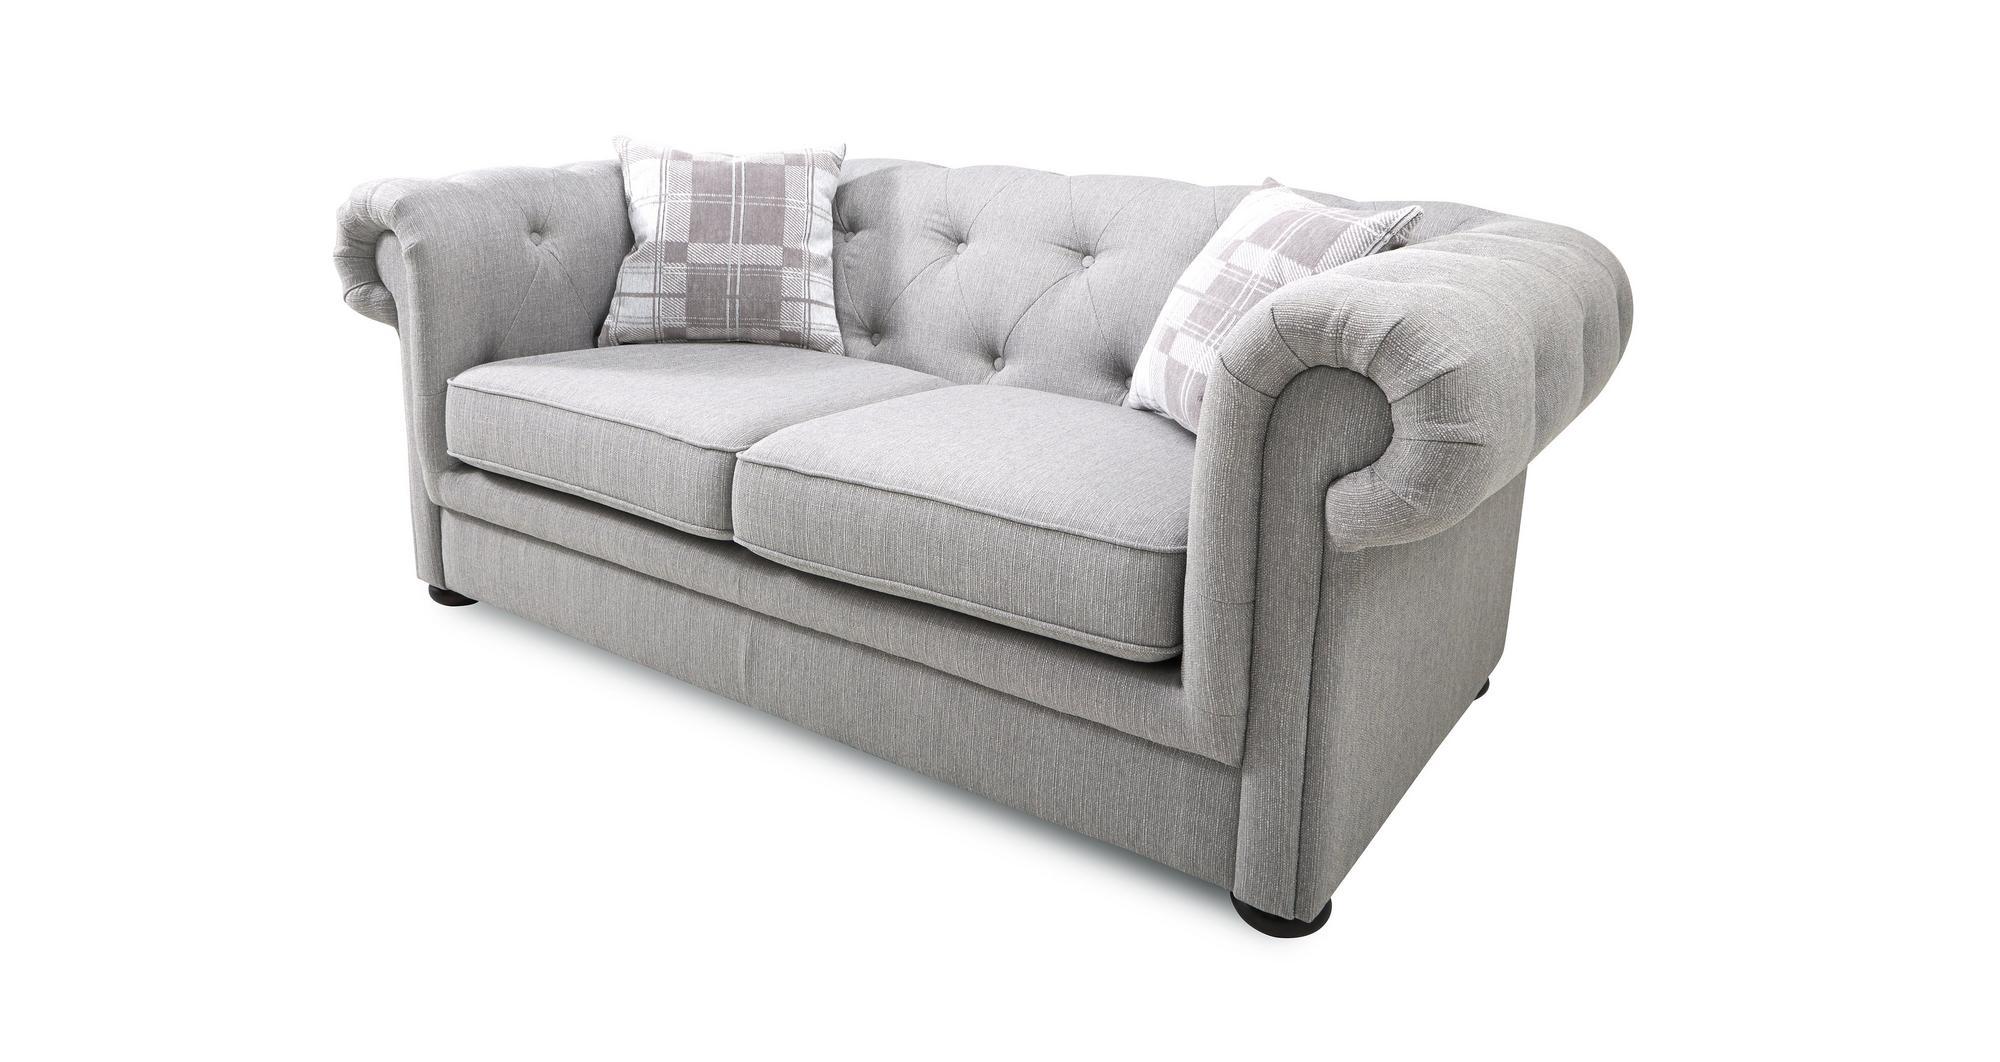 Dfs Opera Ash Grey Fabric 2 Seater Sofa Bed Ebay